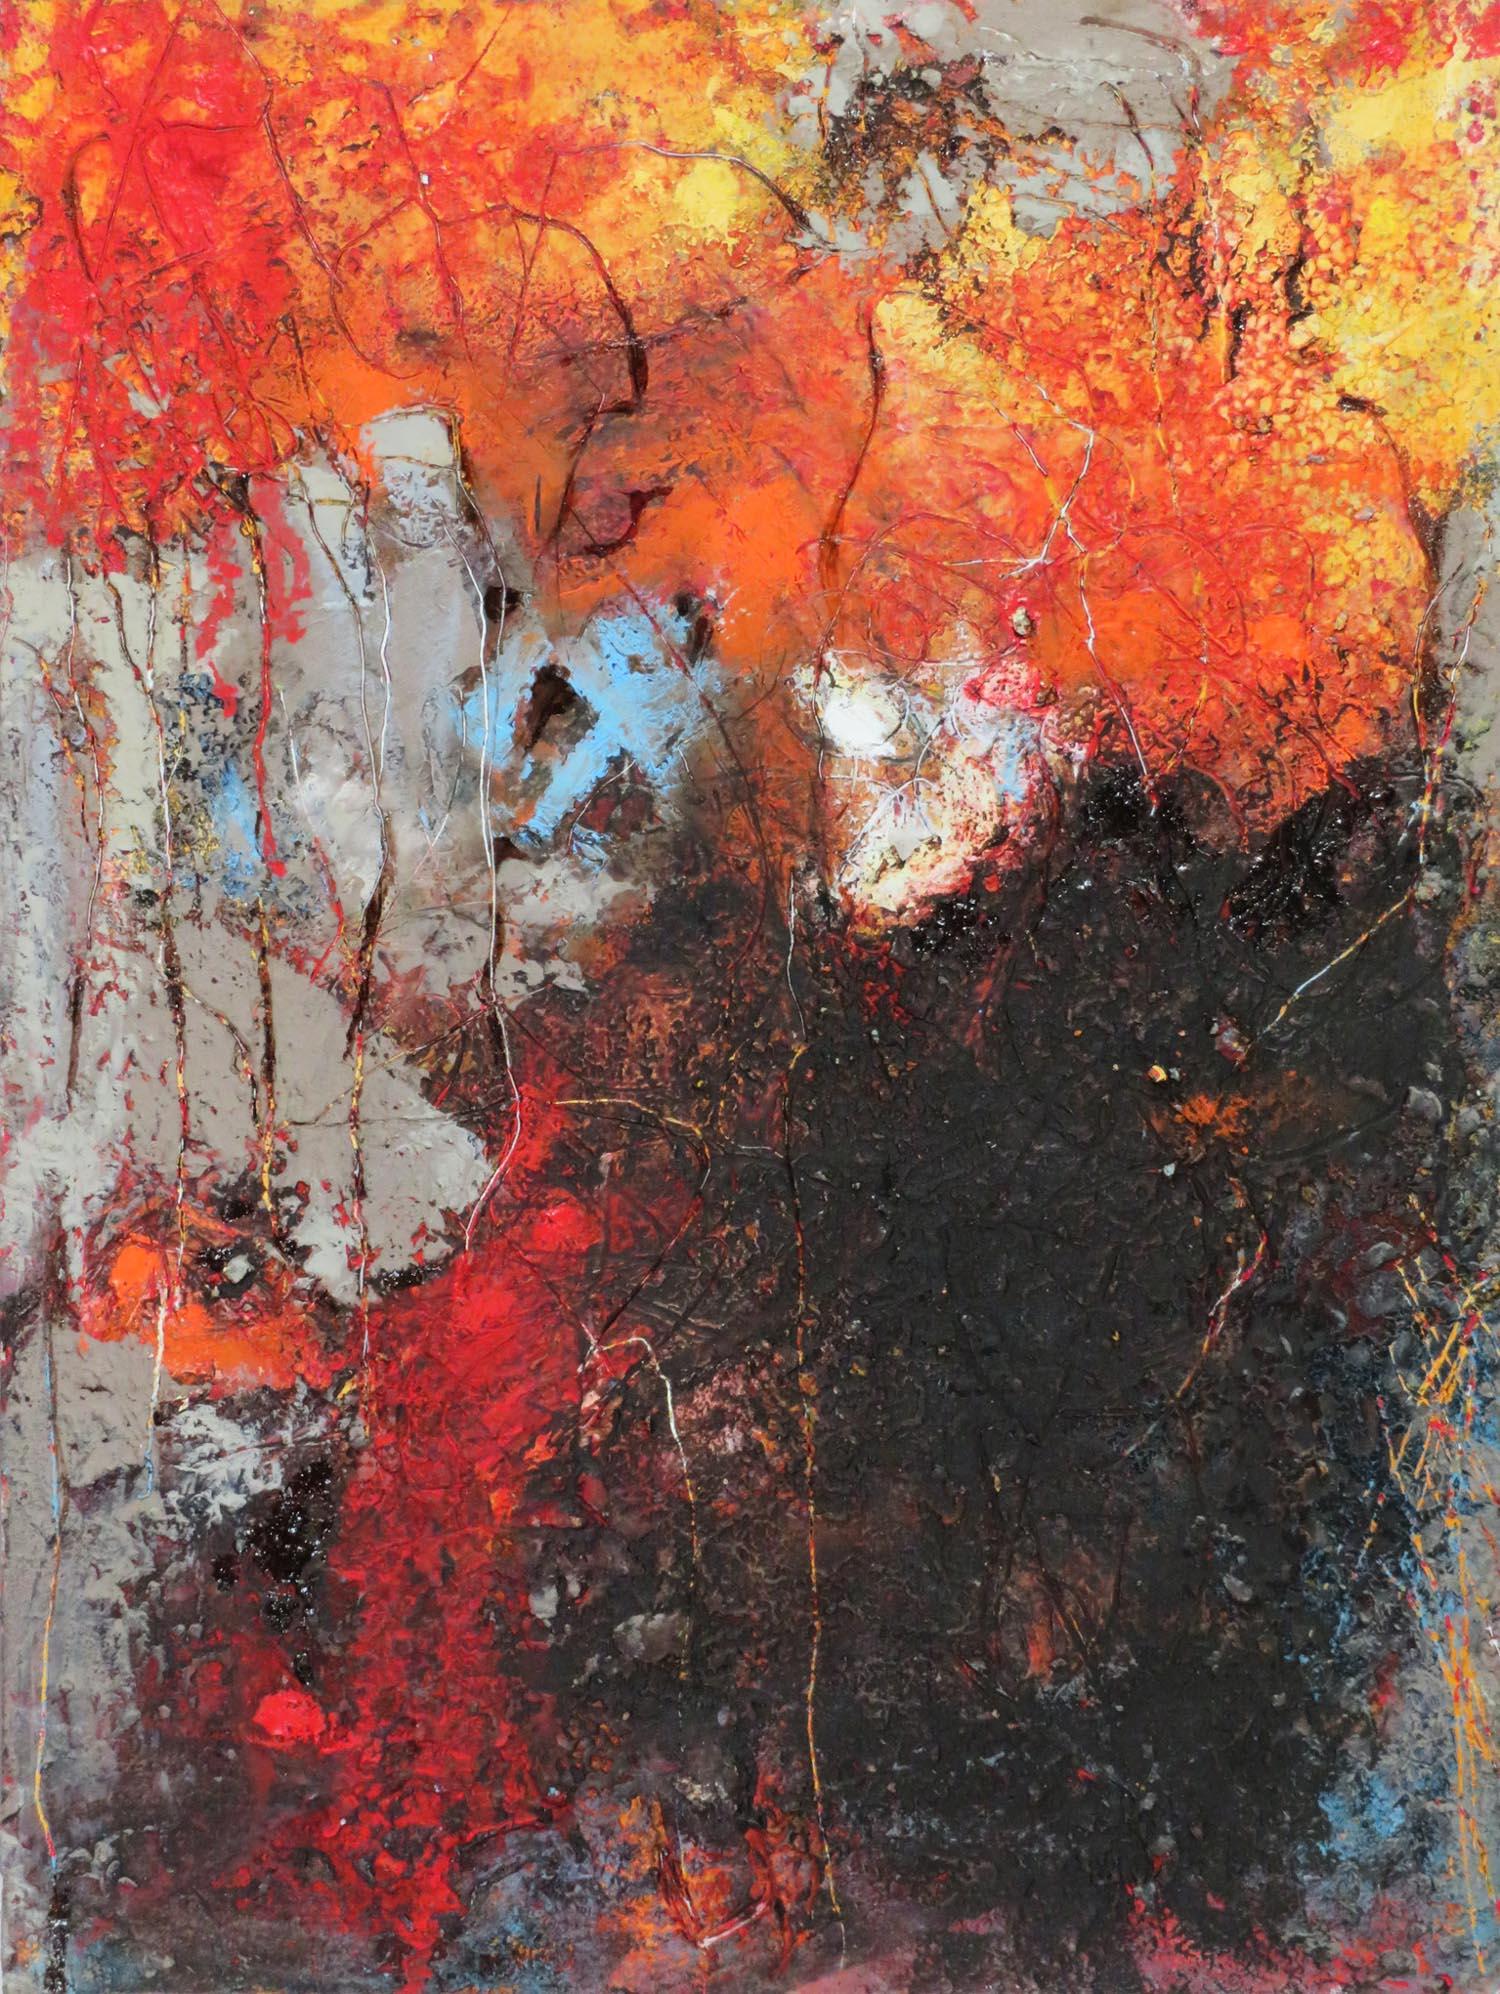 """Wild Torches II"", oil & cold wax on cradled birch, 16 x 12 in."